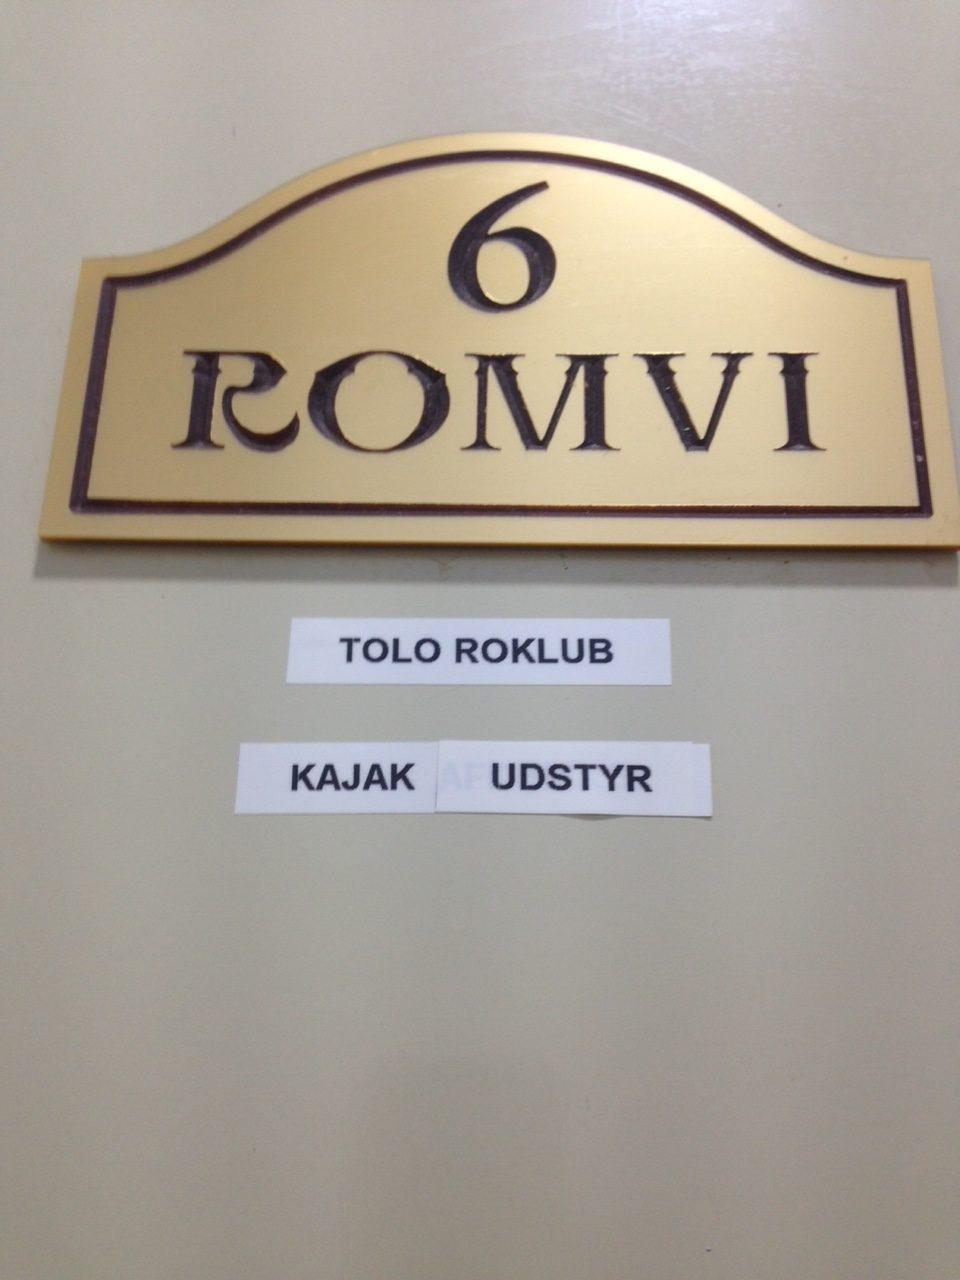 Room 6 - Kajakudstyr